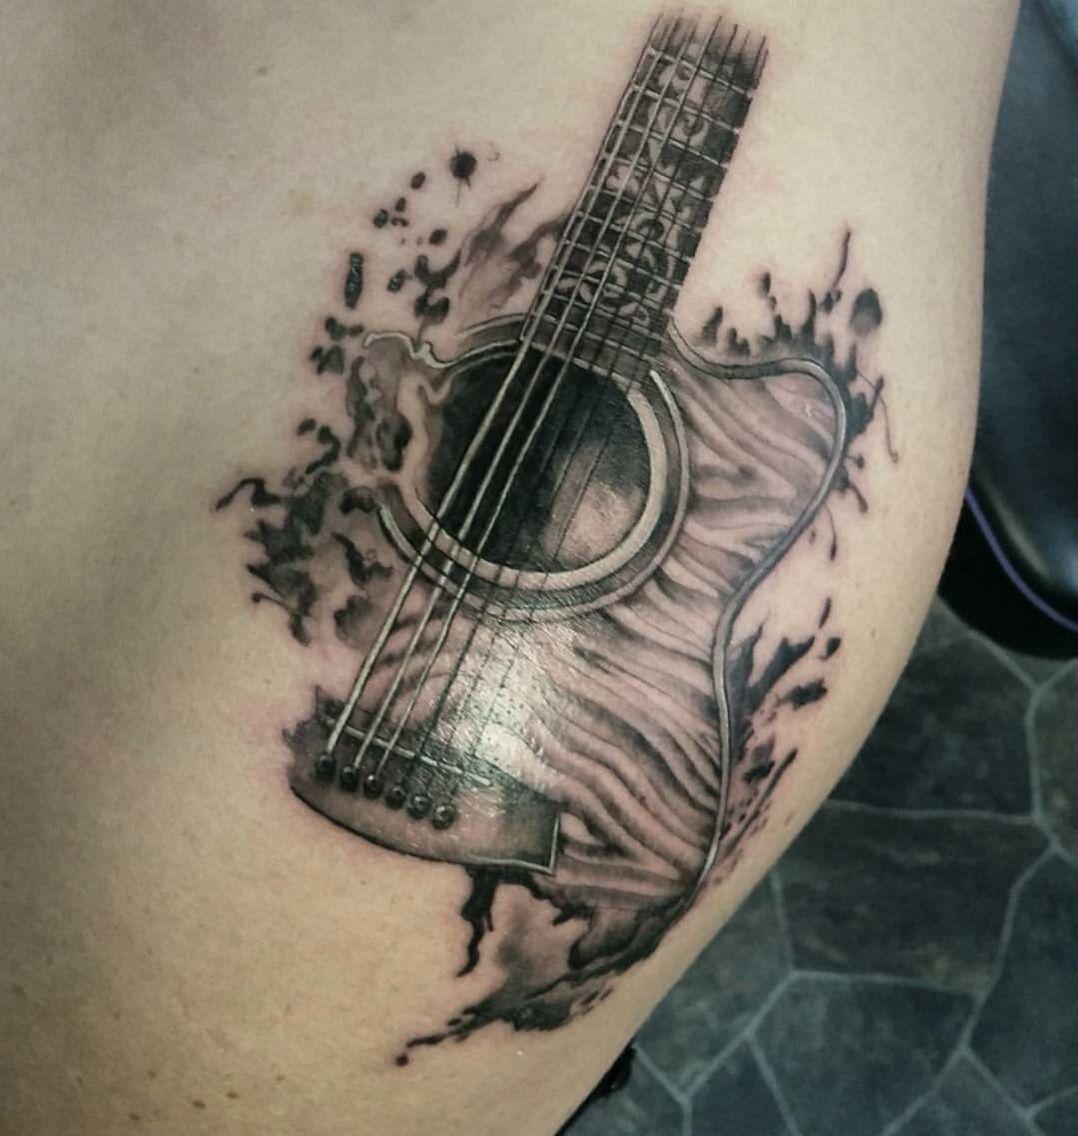 Tattoo Ideas Music: Tricky Guitar Shoulder Piece